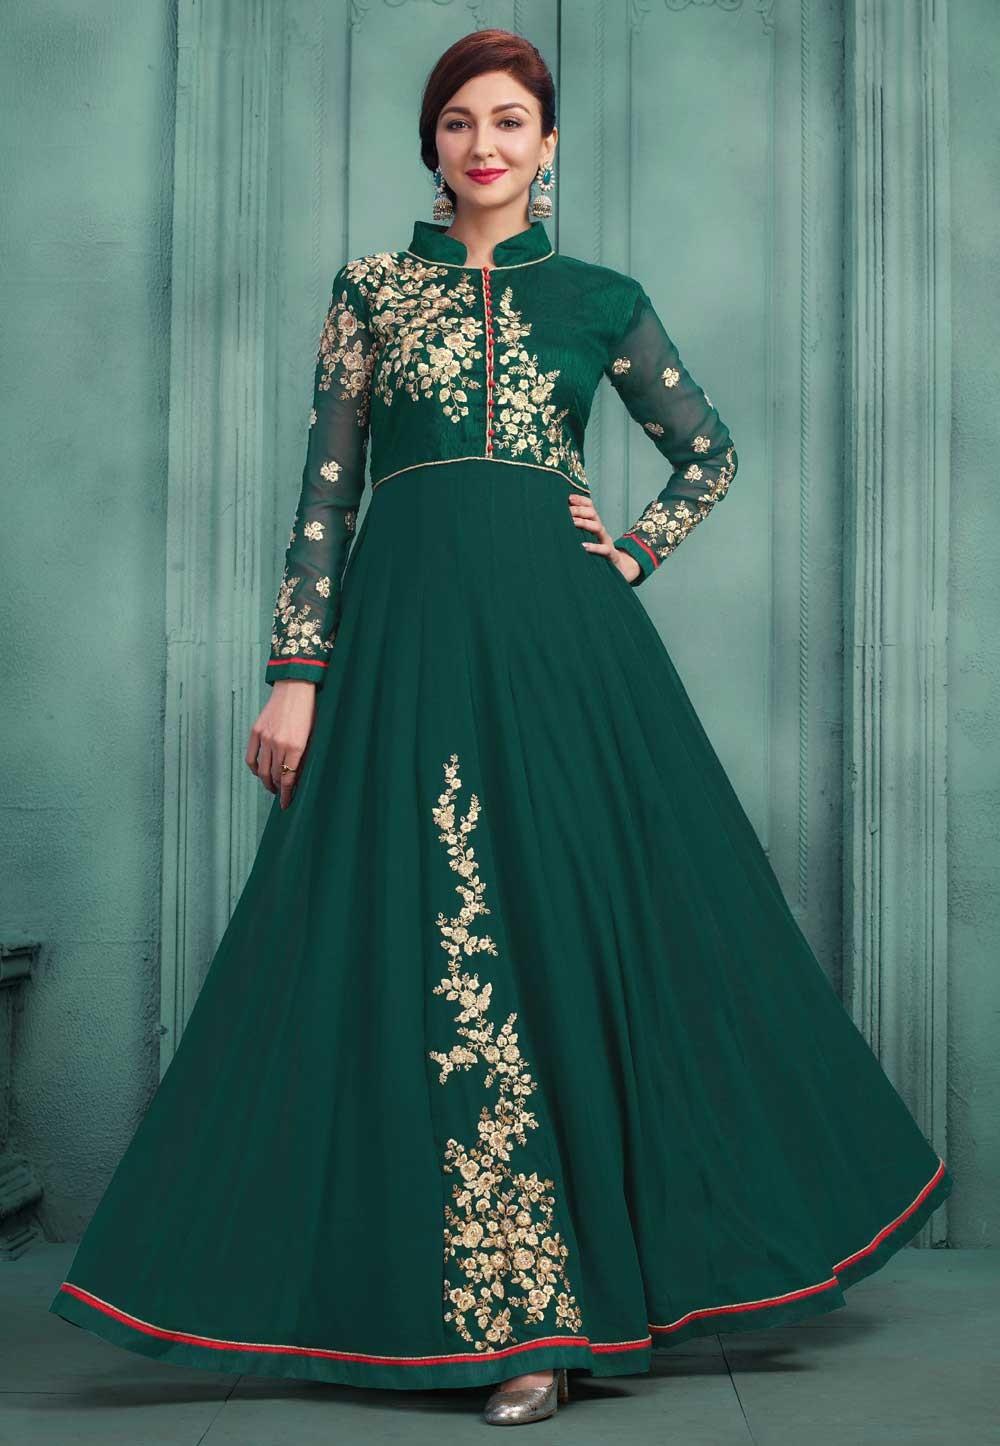 Beautiful Green Color Party Wear Salwar Kameez